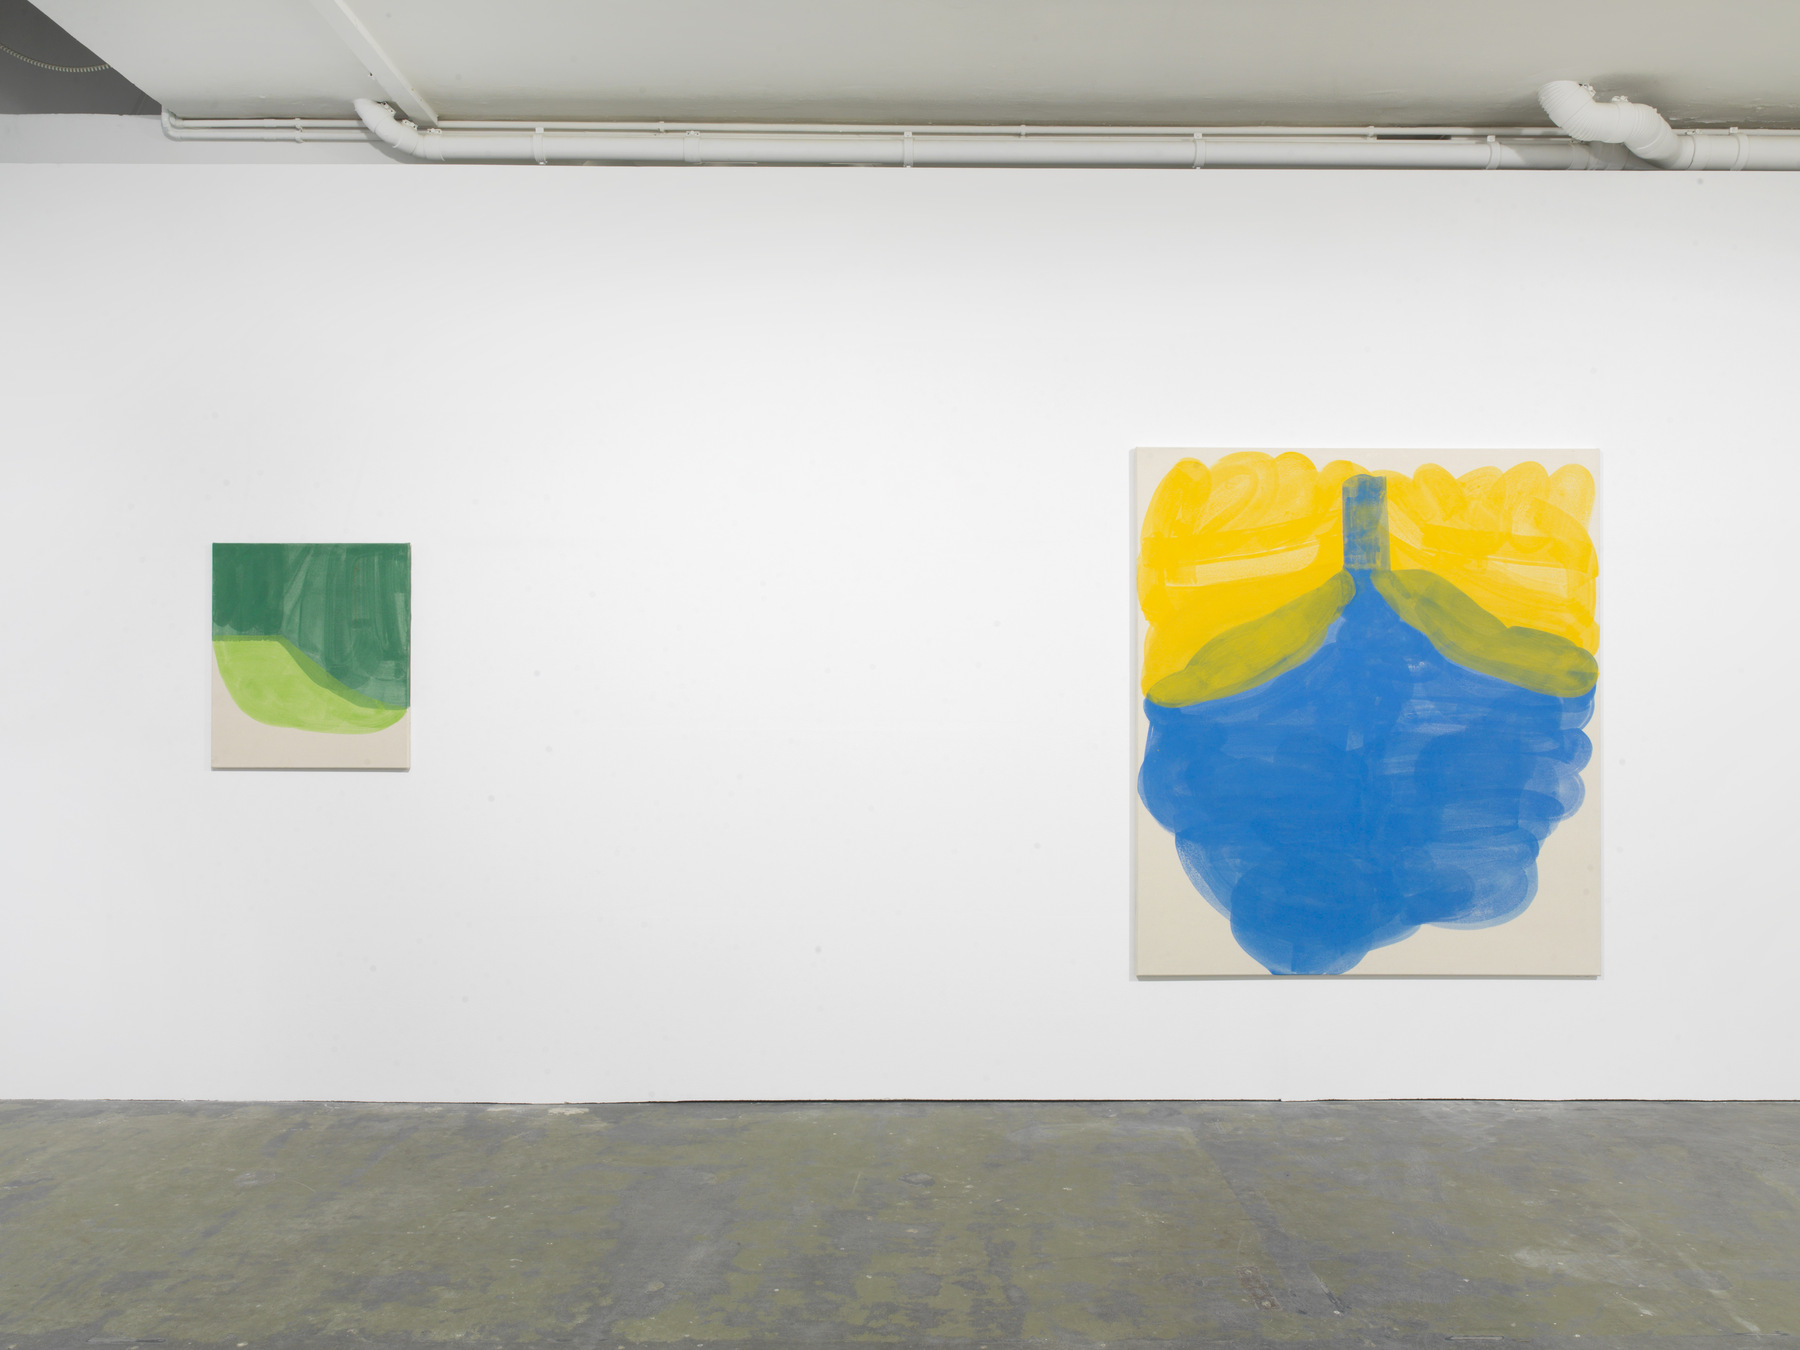 Tamina Amadyar_10,000 hours_Galerie Guido W. Baudach, Berlin_09